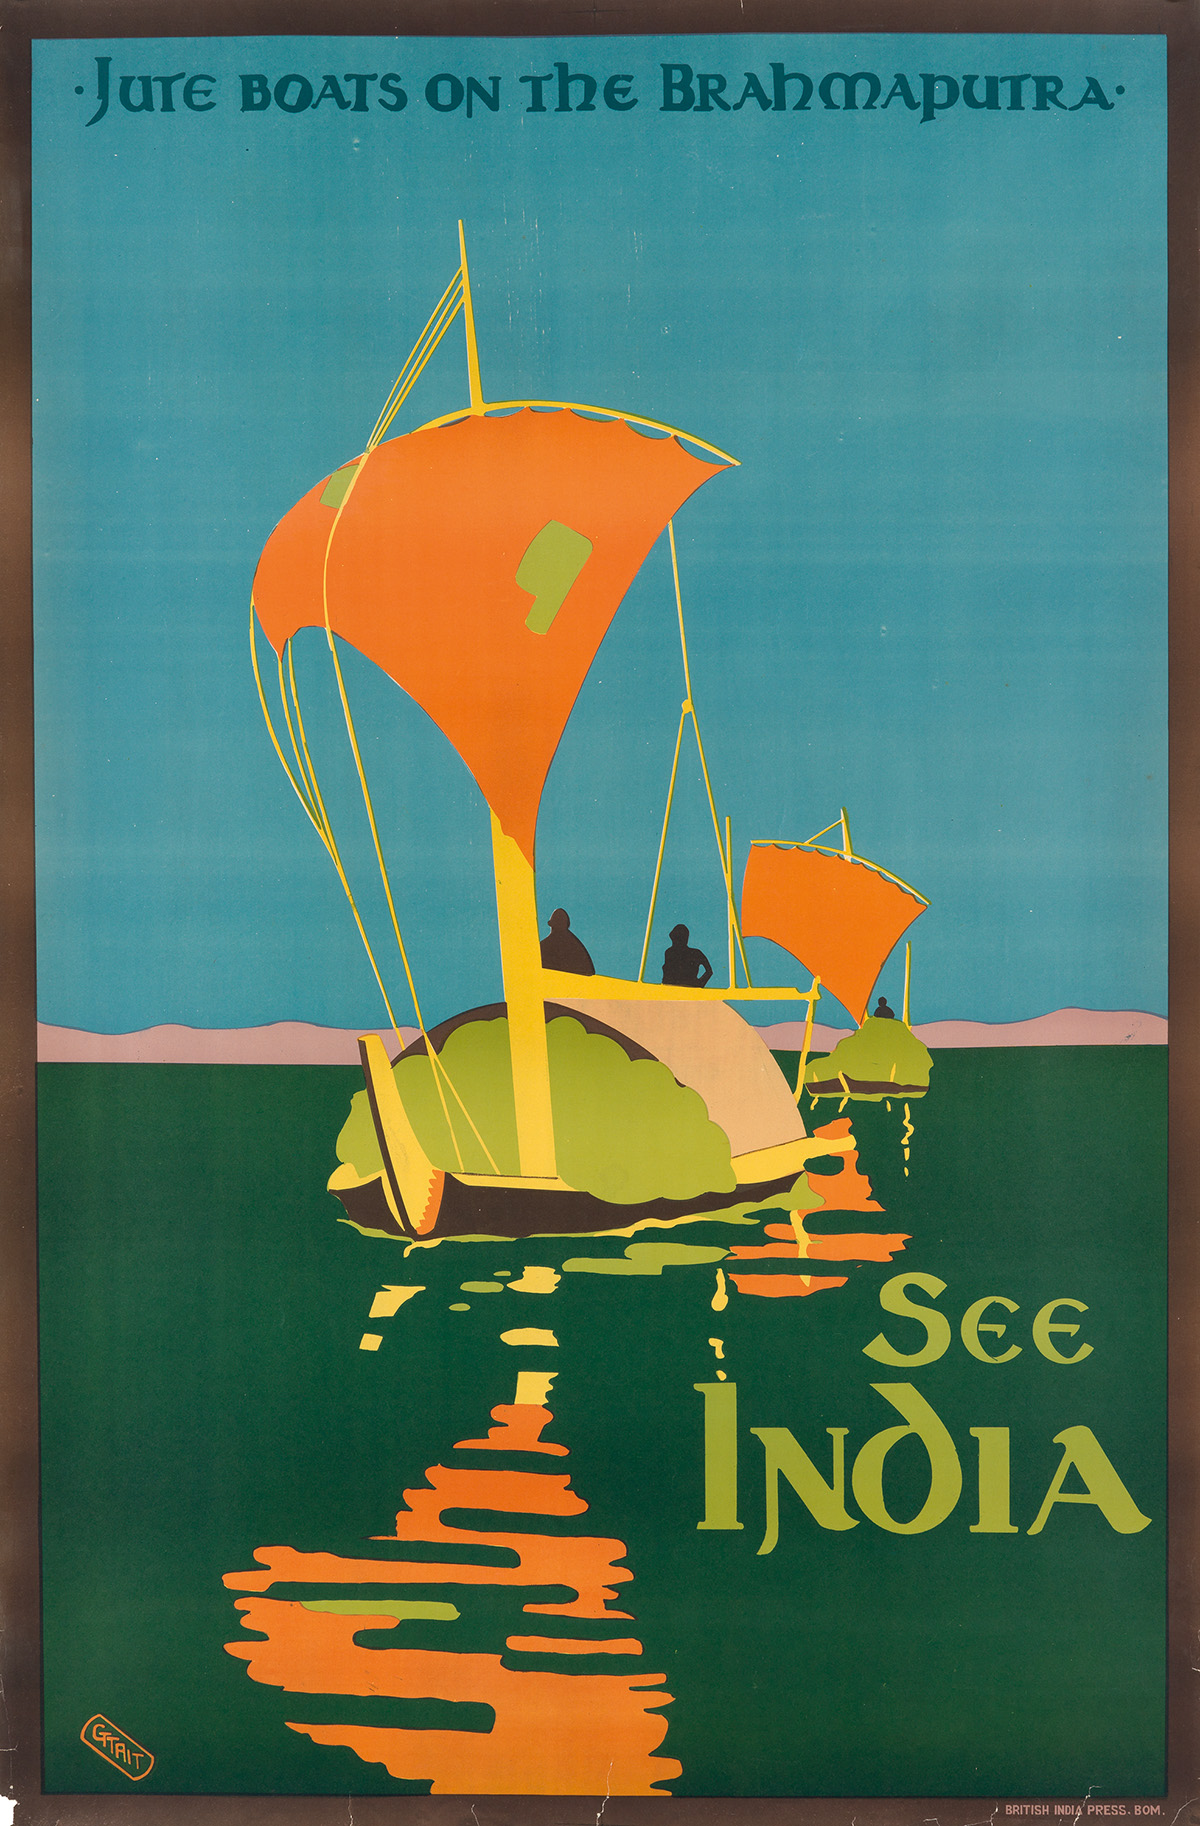 GERALD GEORGE WYNNE TREVREDYN TAIT (1891-1954). SEE INDIA / JUTE BOATS ON THE BRAHMAPUTRA. Circa 1930s. 40x24 inches, 102x63 cm. Britis